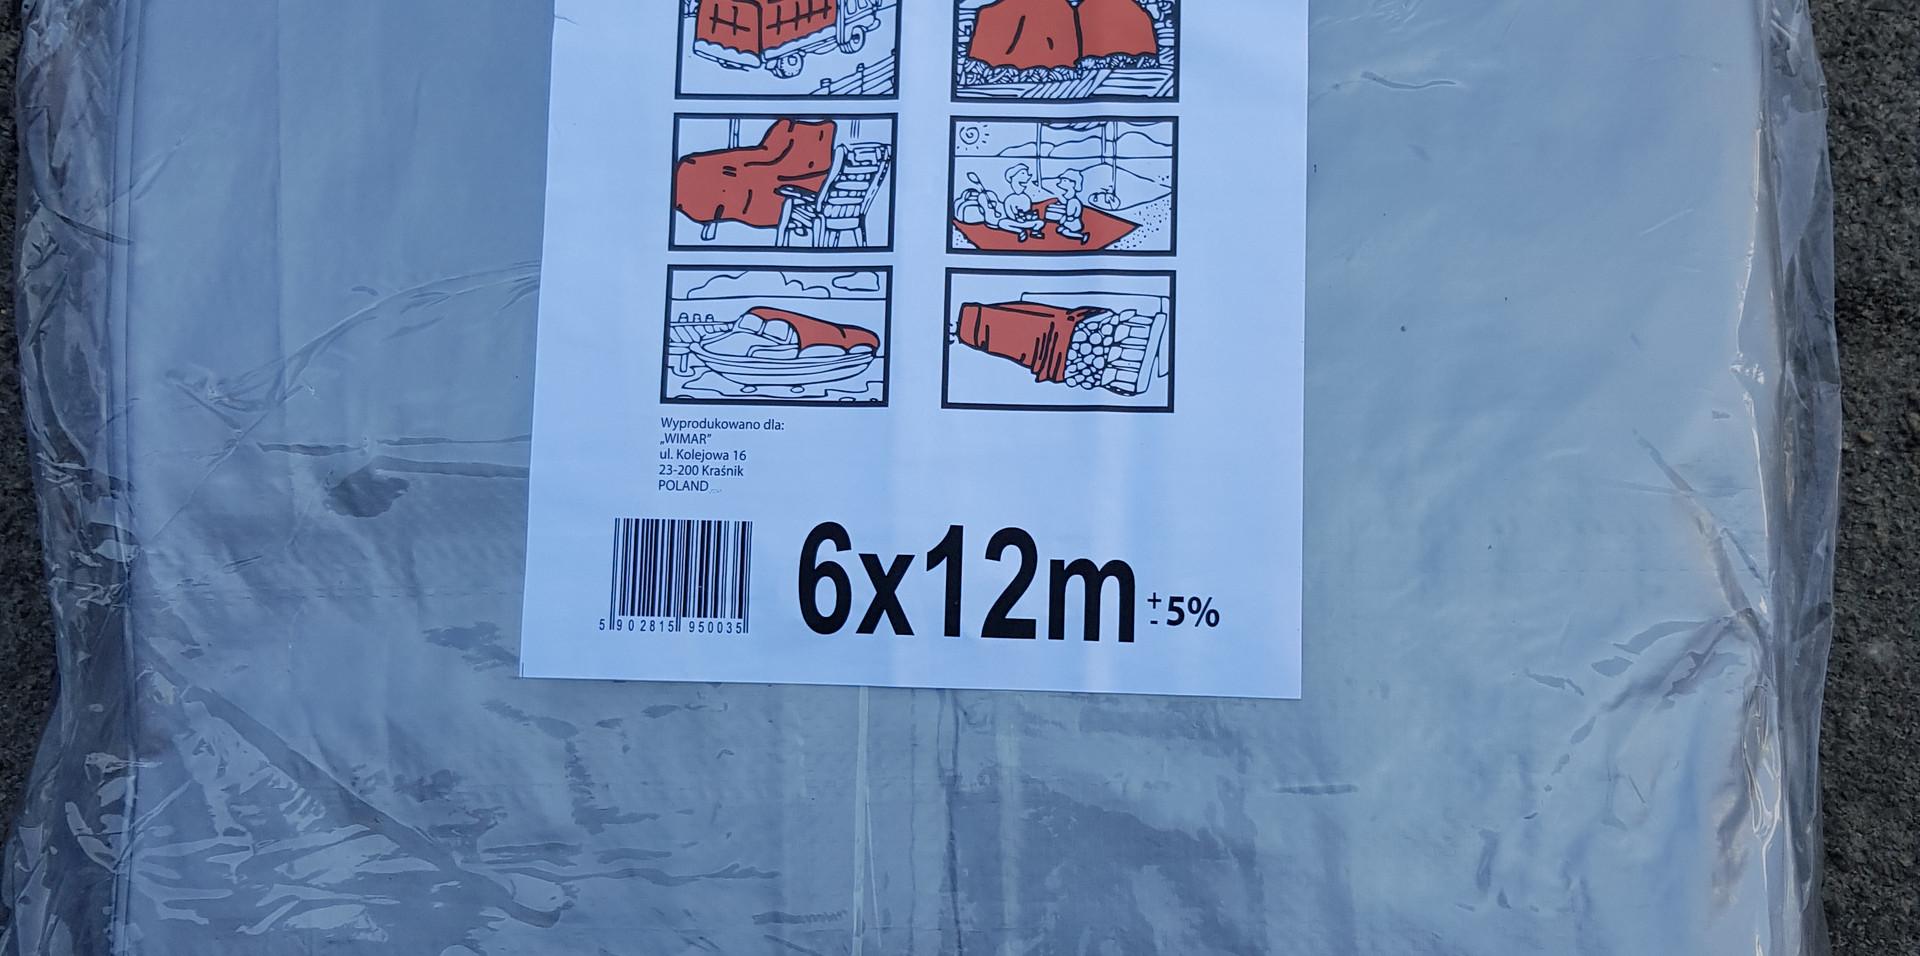 Тент TENEXIM 160 г/м2 р. 6x12 м. SUPER MOCNY